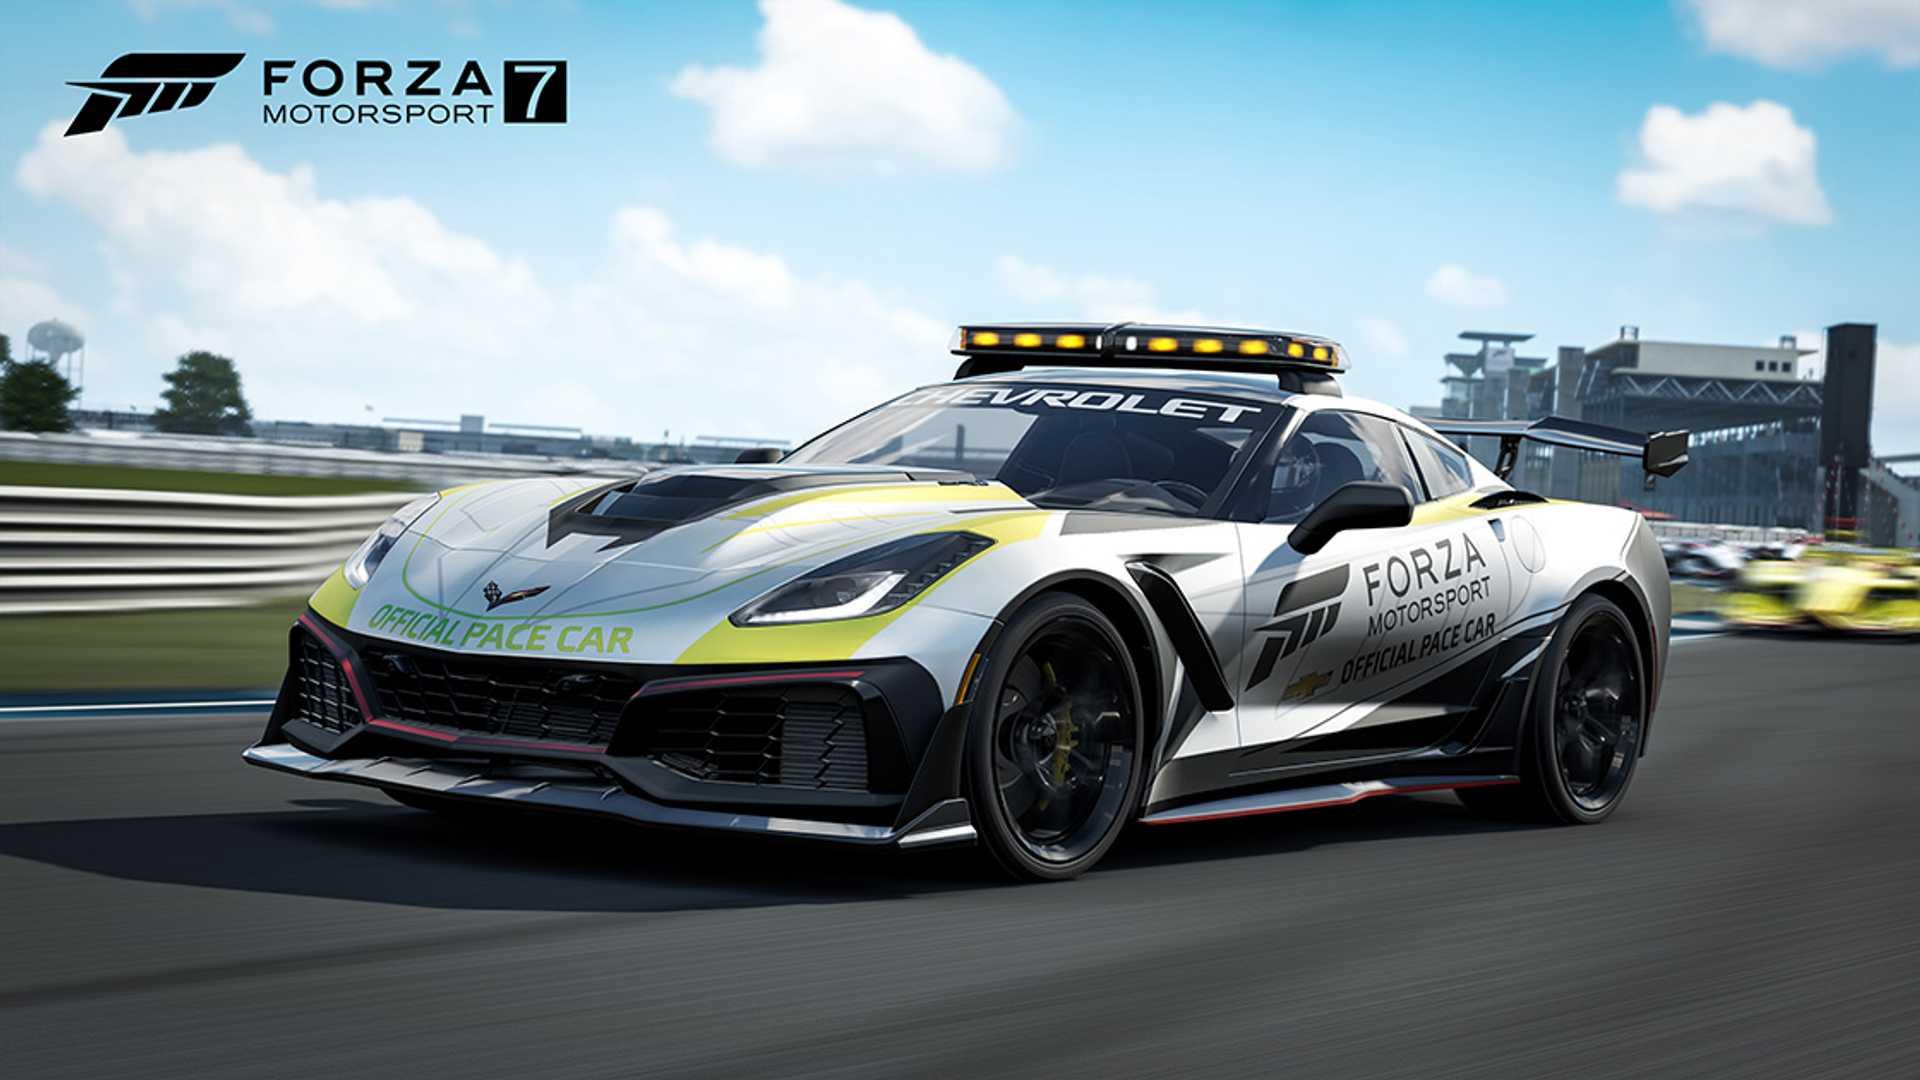 forza-motorsport-7-may-2019-update-5